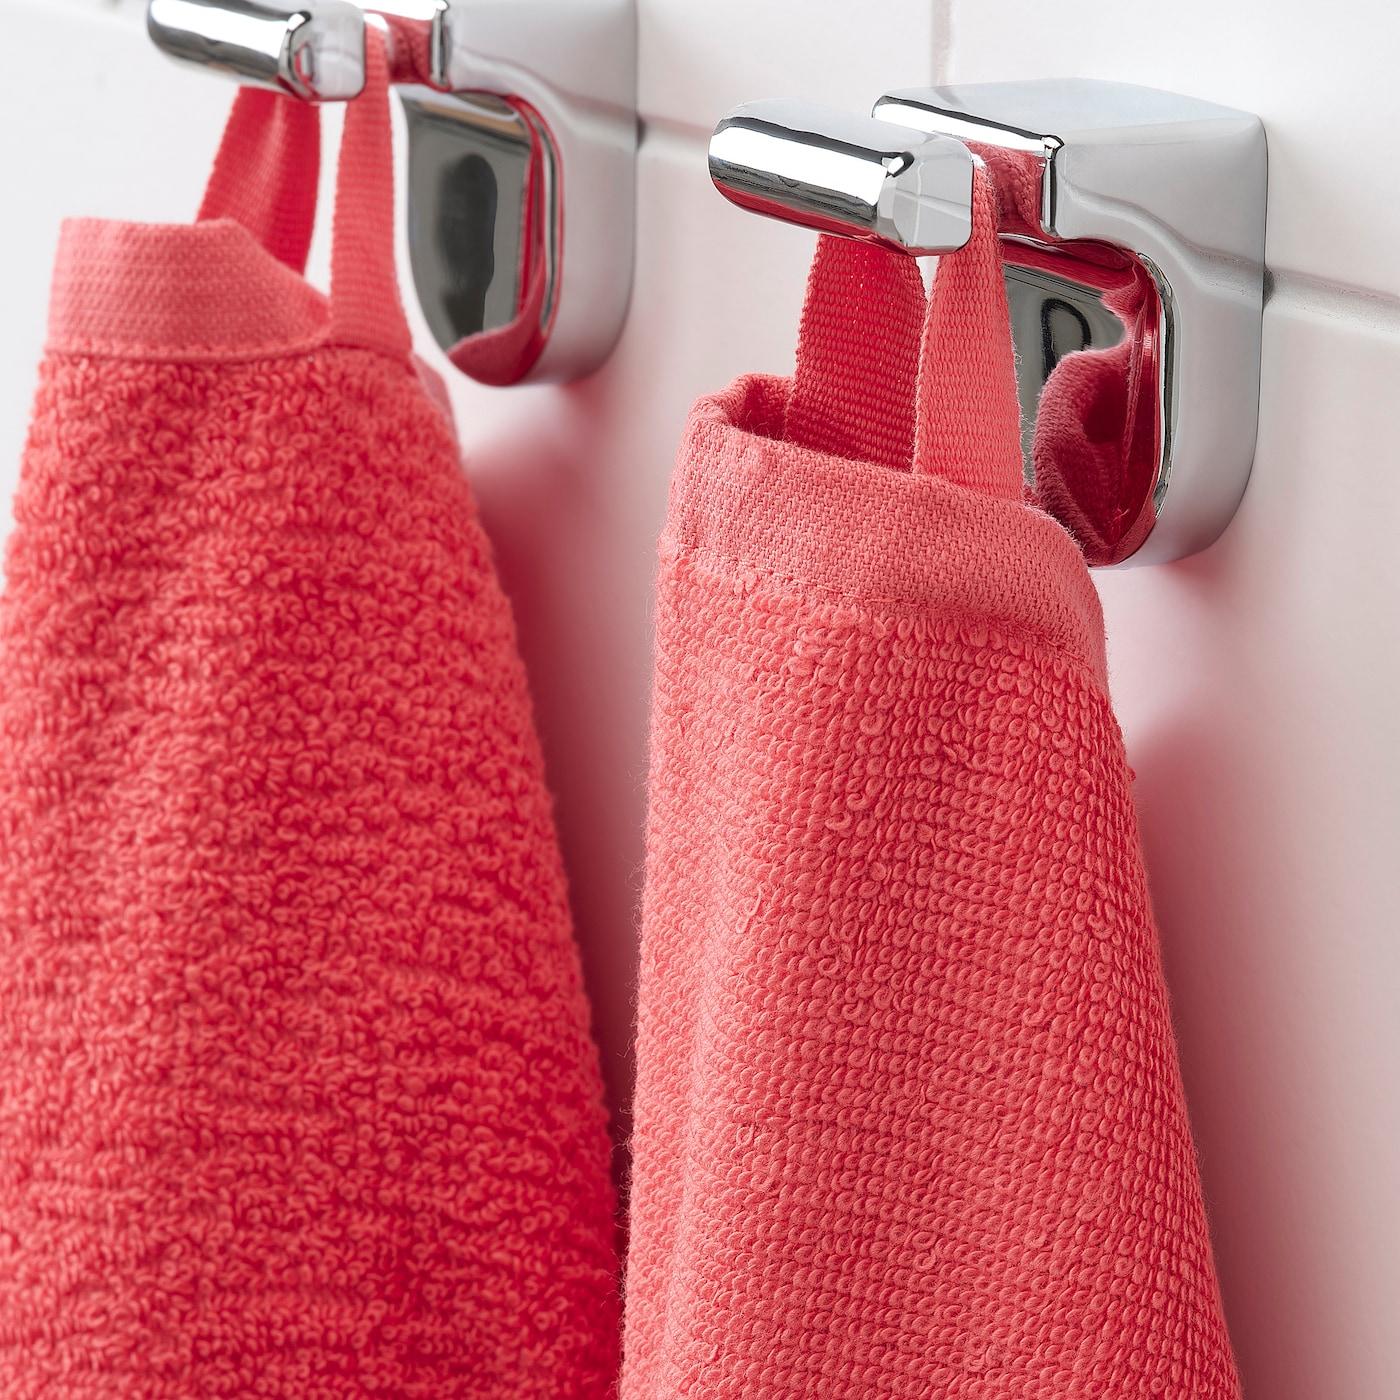 VÅGSJÖN Toalla de baño - rojo claro 70x140 cm